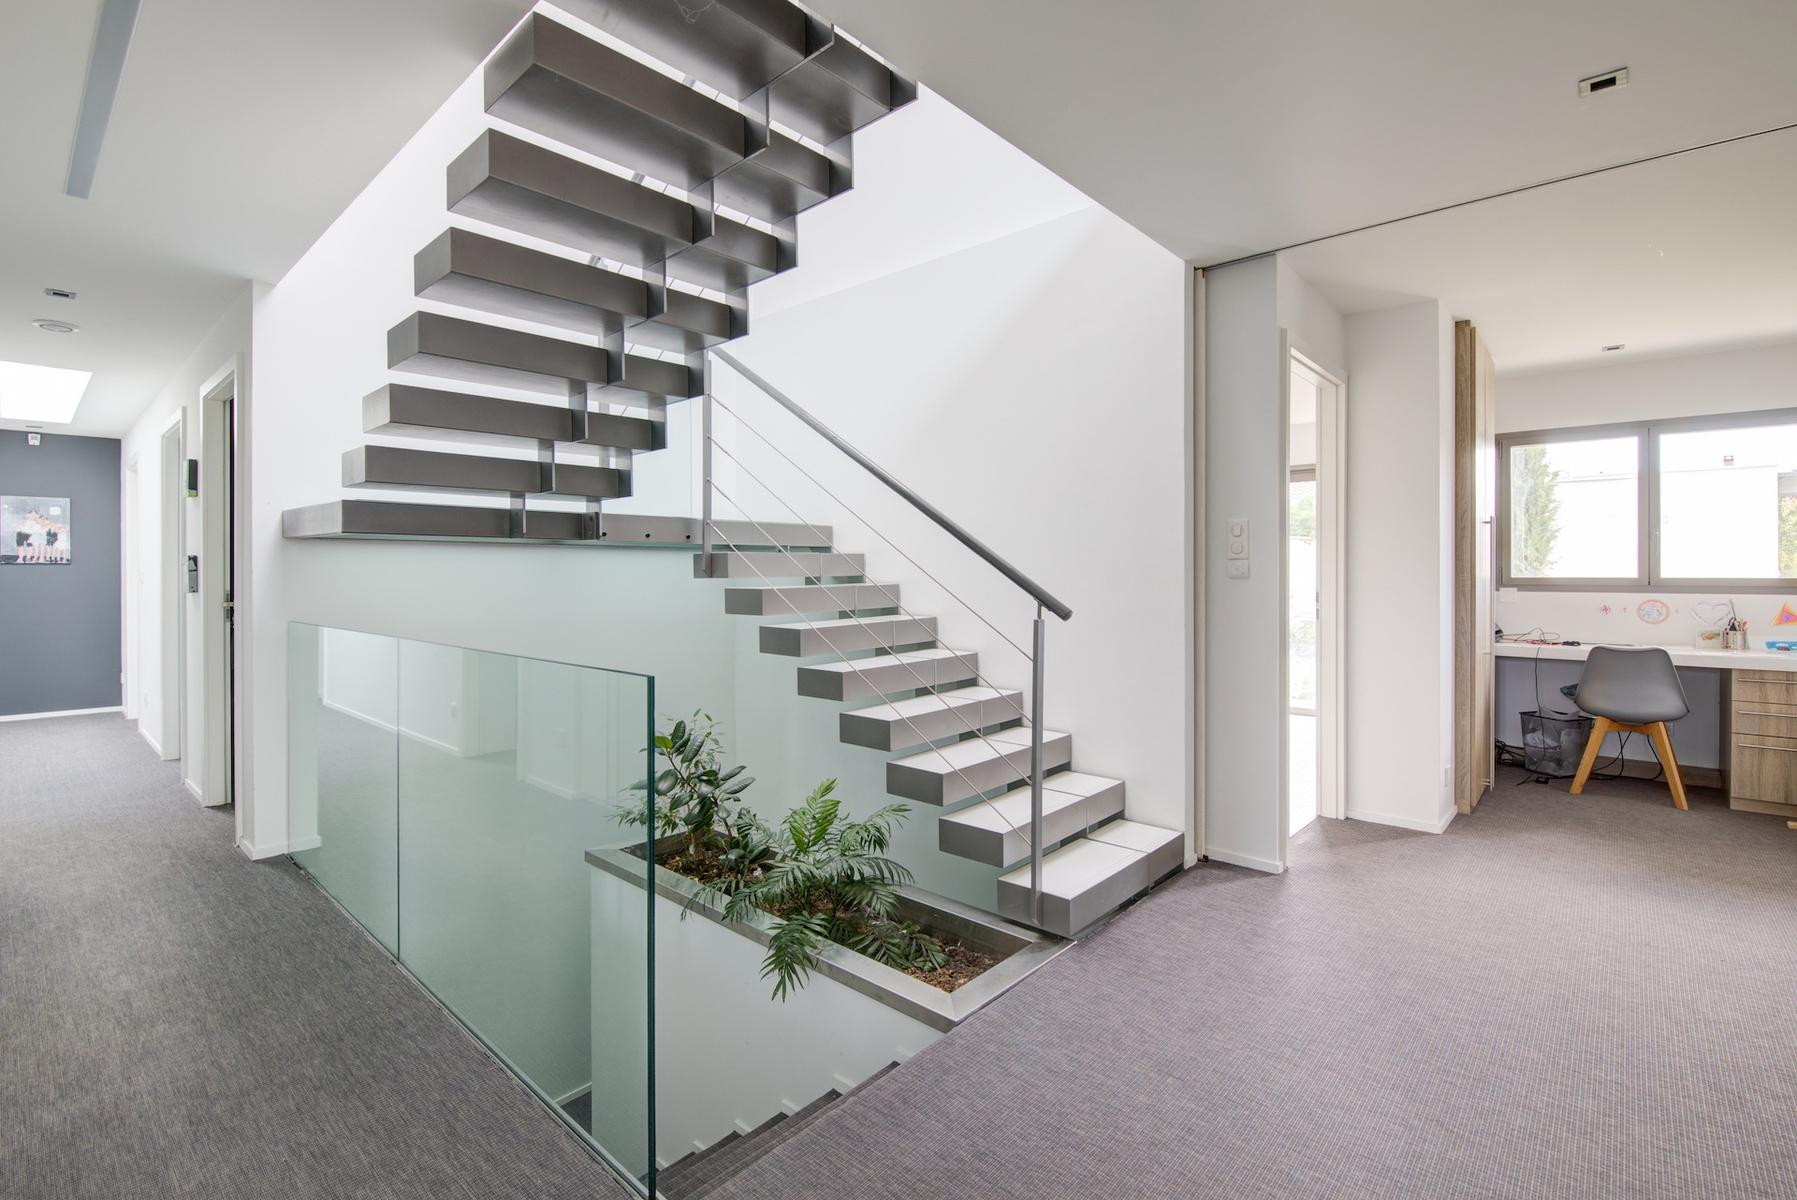 Prix Corian Au M2 brindas, maison, 1 196 000 euros sur immobilier.lefigaro.fr